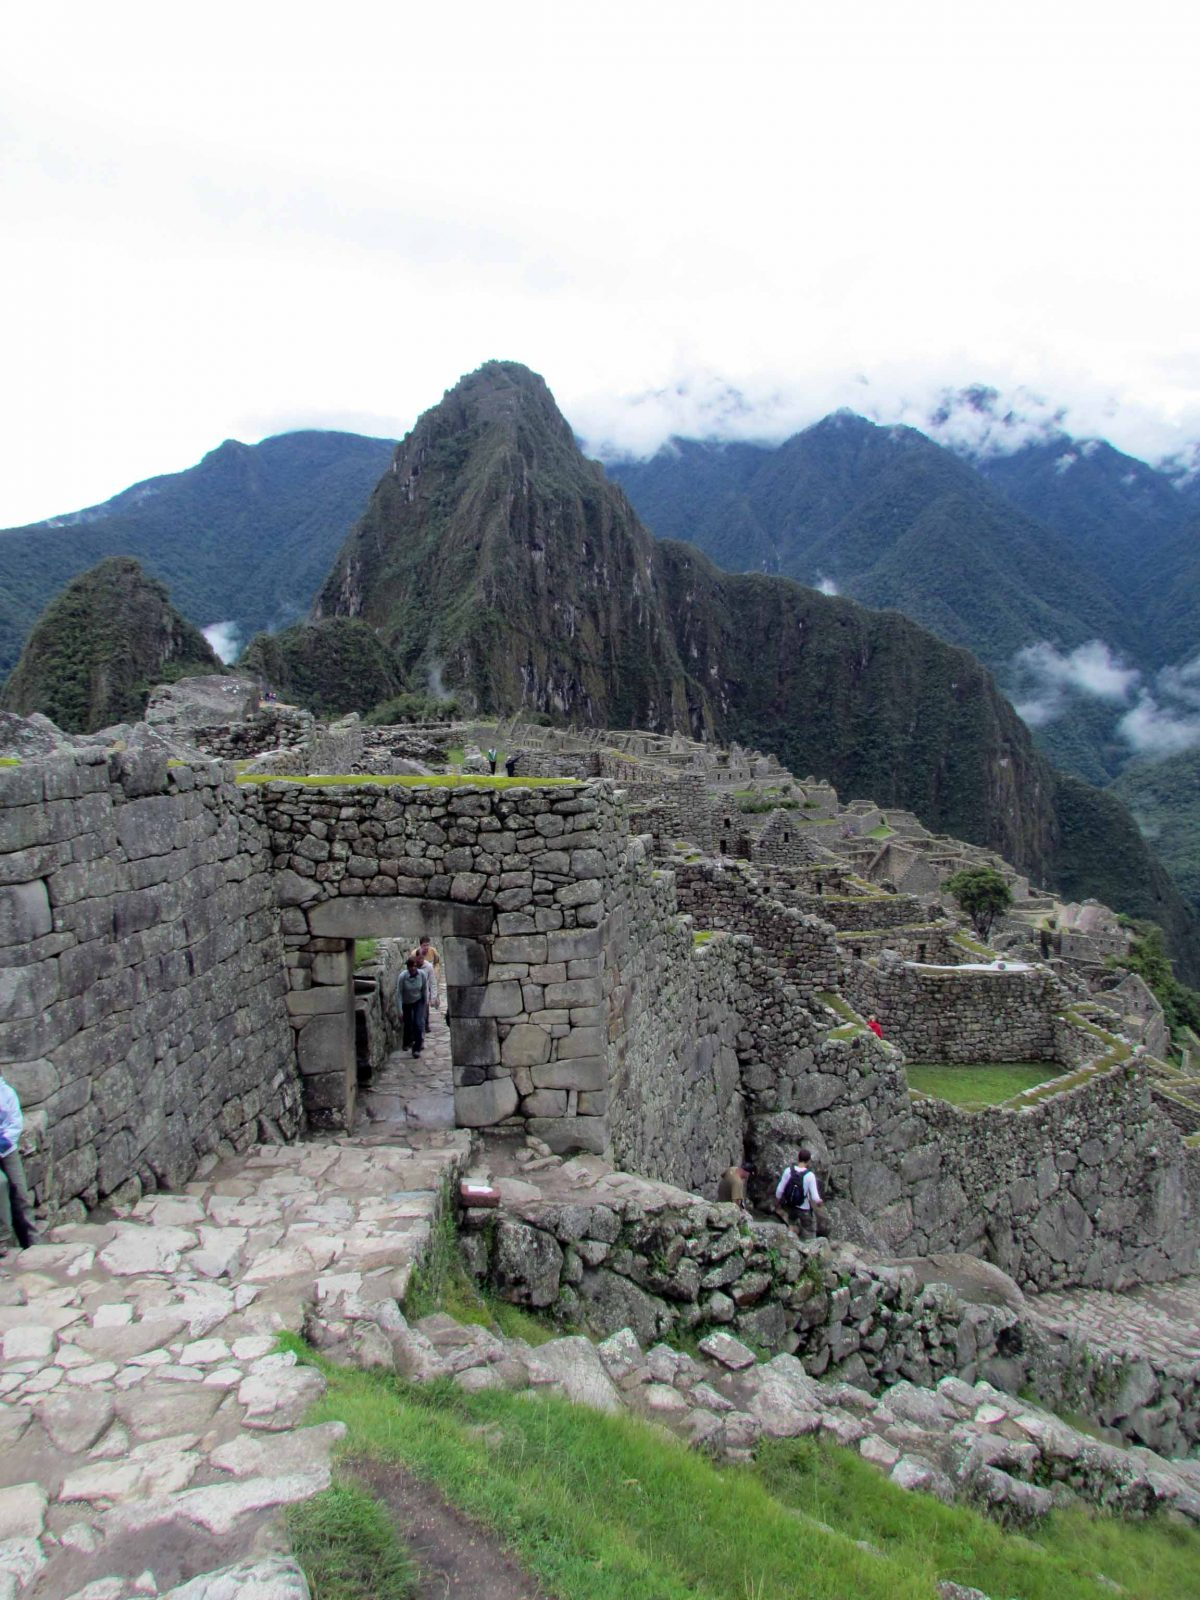 Wayna Picchu stands behind Machu Picchu, Peru   ©Angela Drake